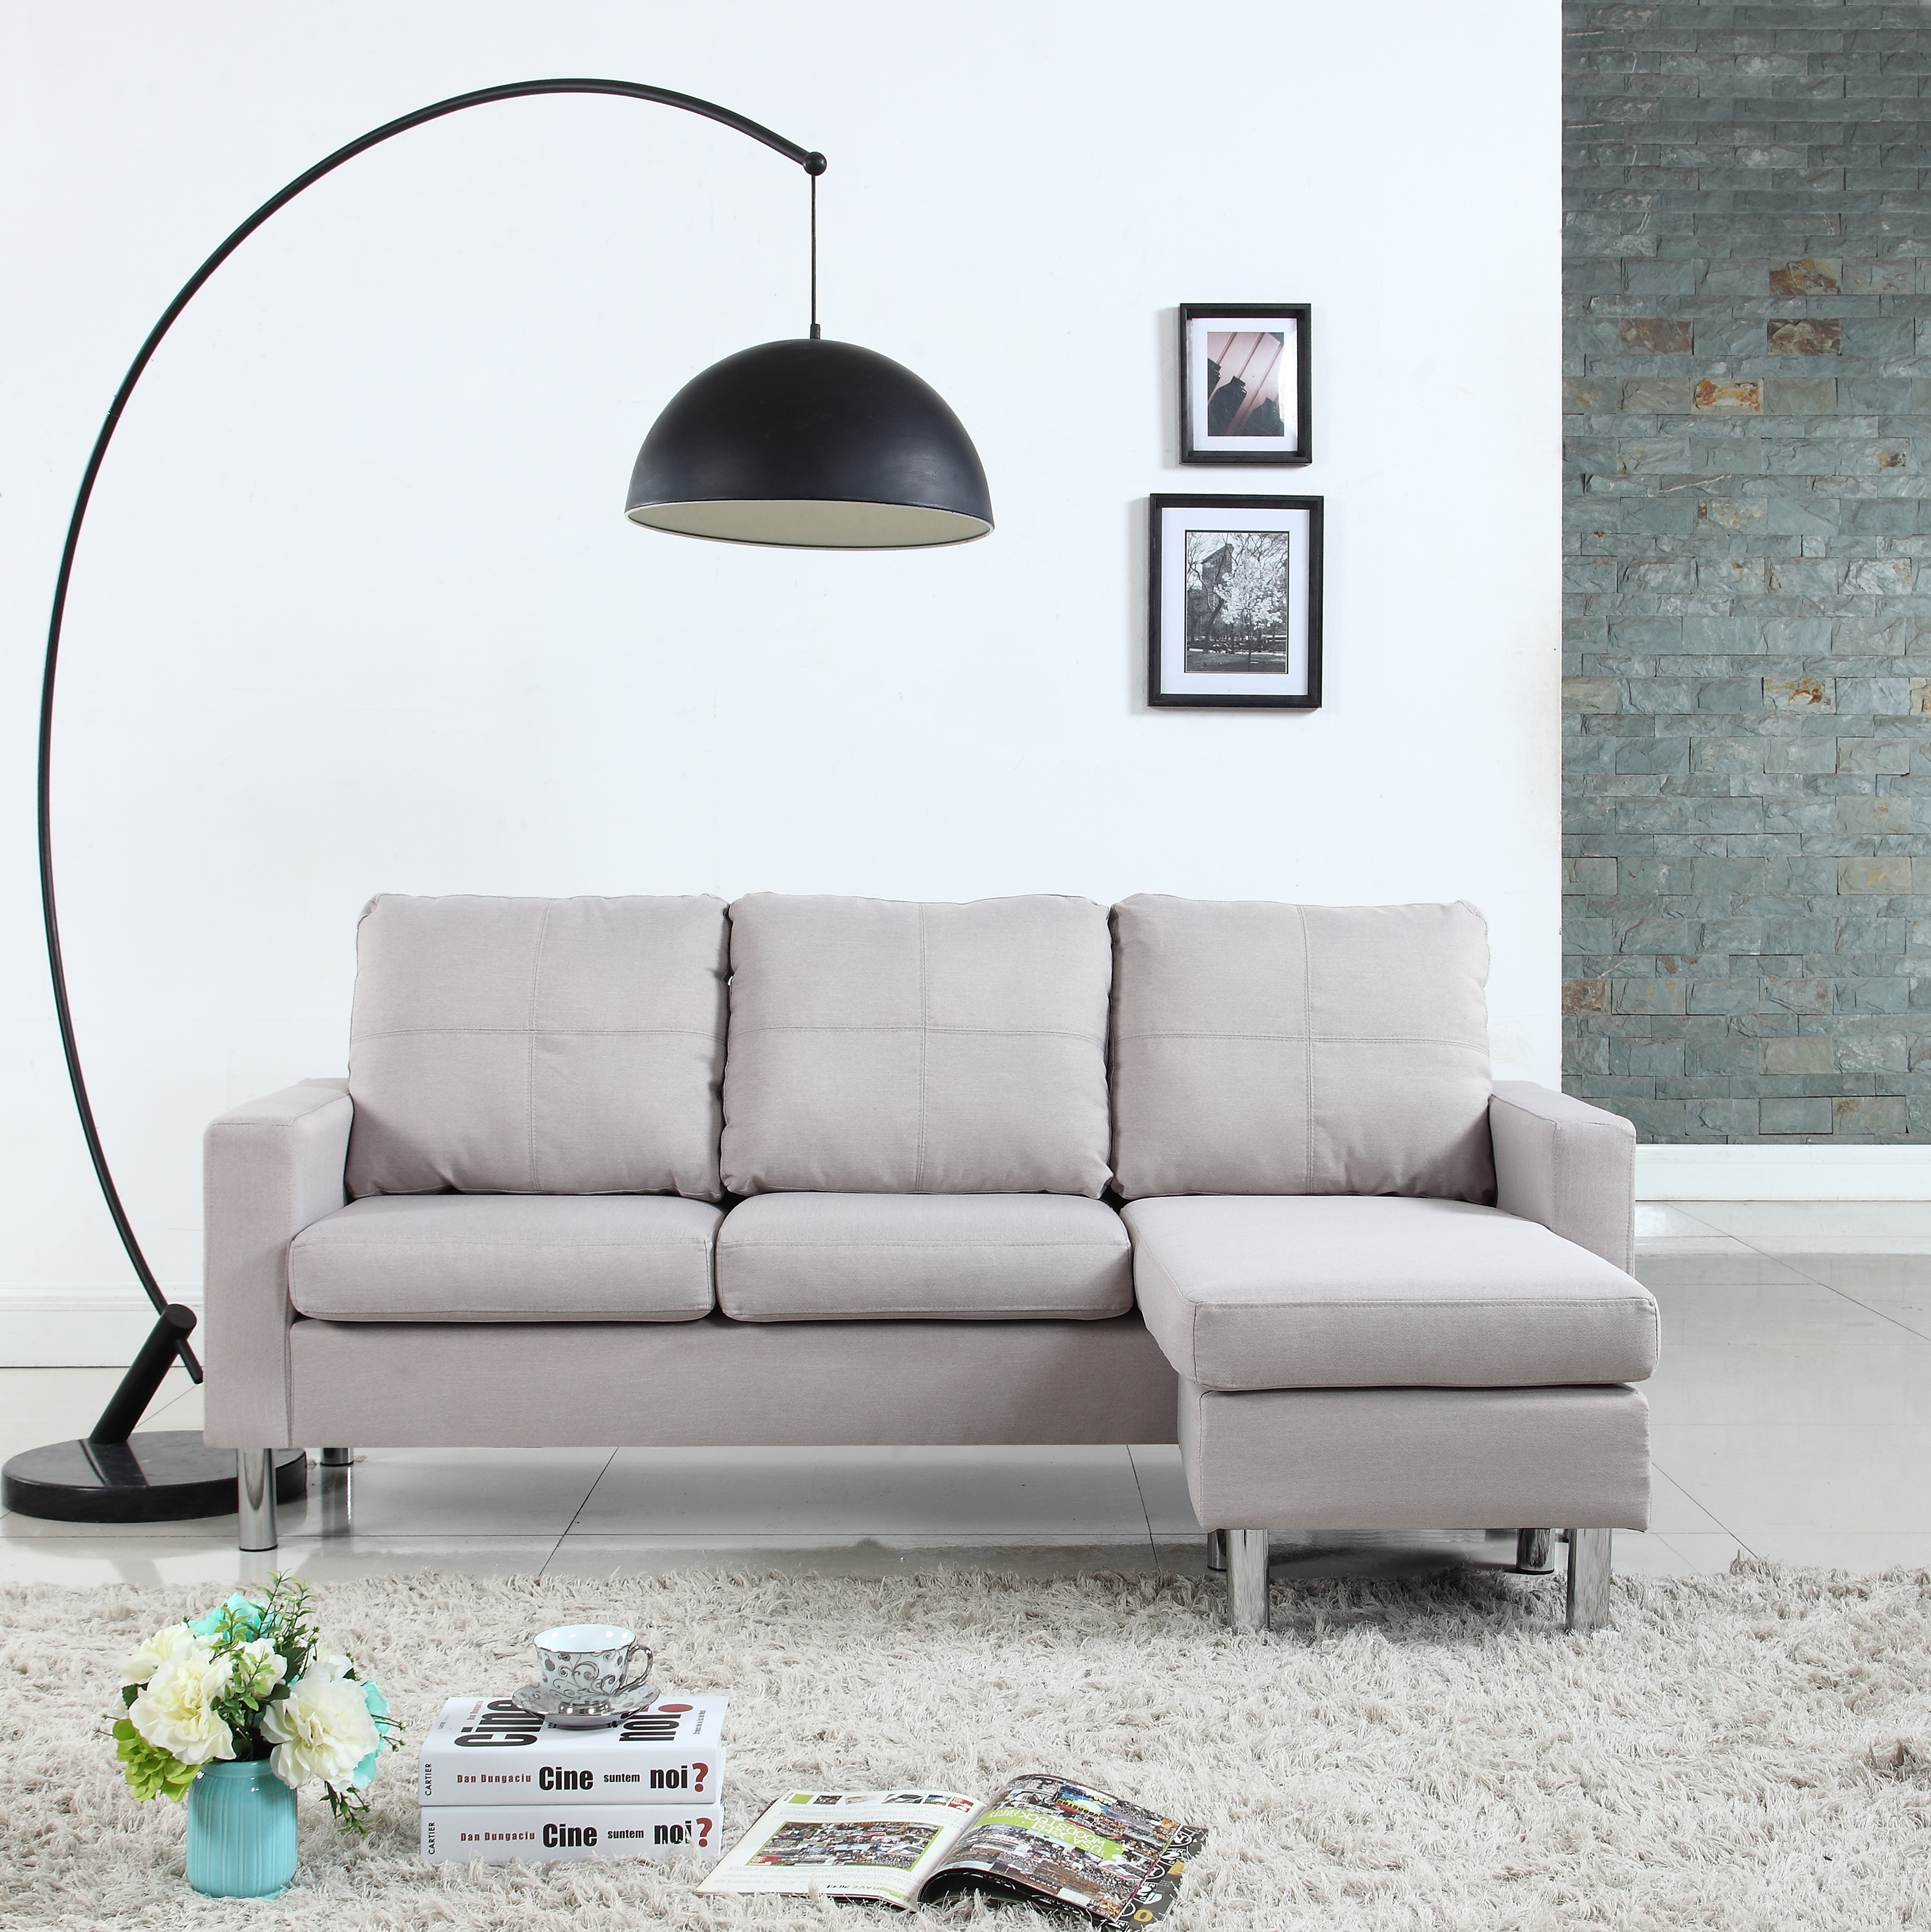 Modern Reversible Small Space Configurable Linen Sectional Sofa